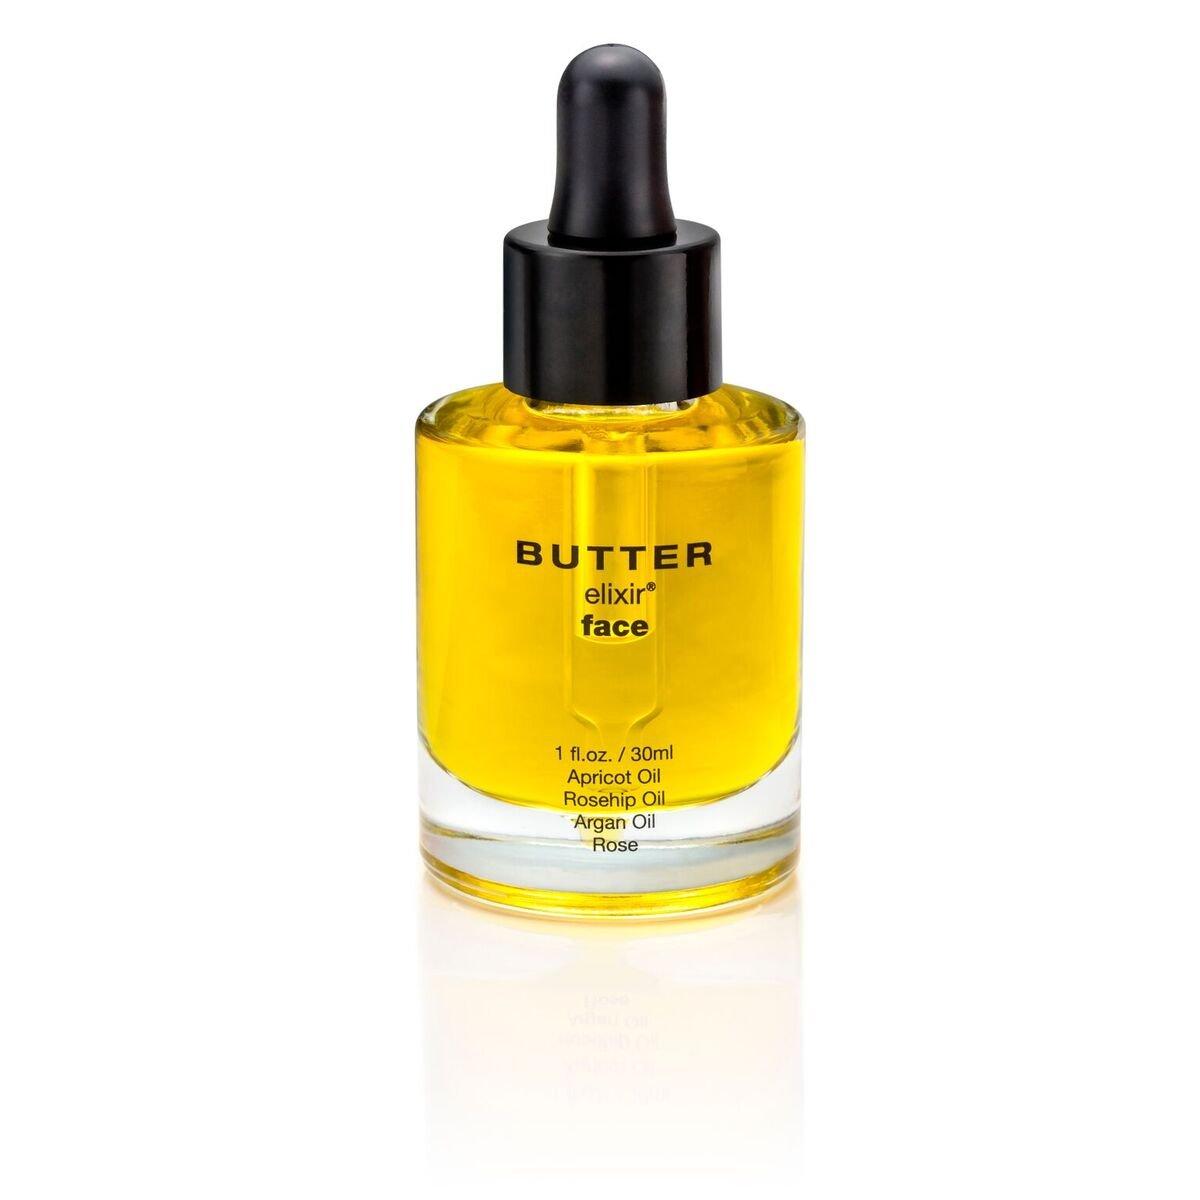 BUTTERelixir 100% All Natural Face Oil - 1 oz - Nourishing and Moisturizing